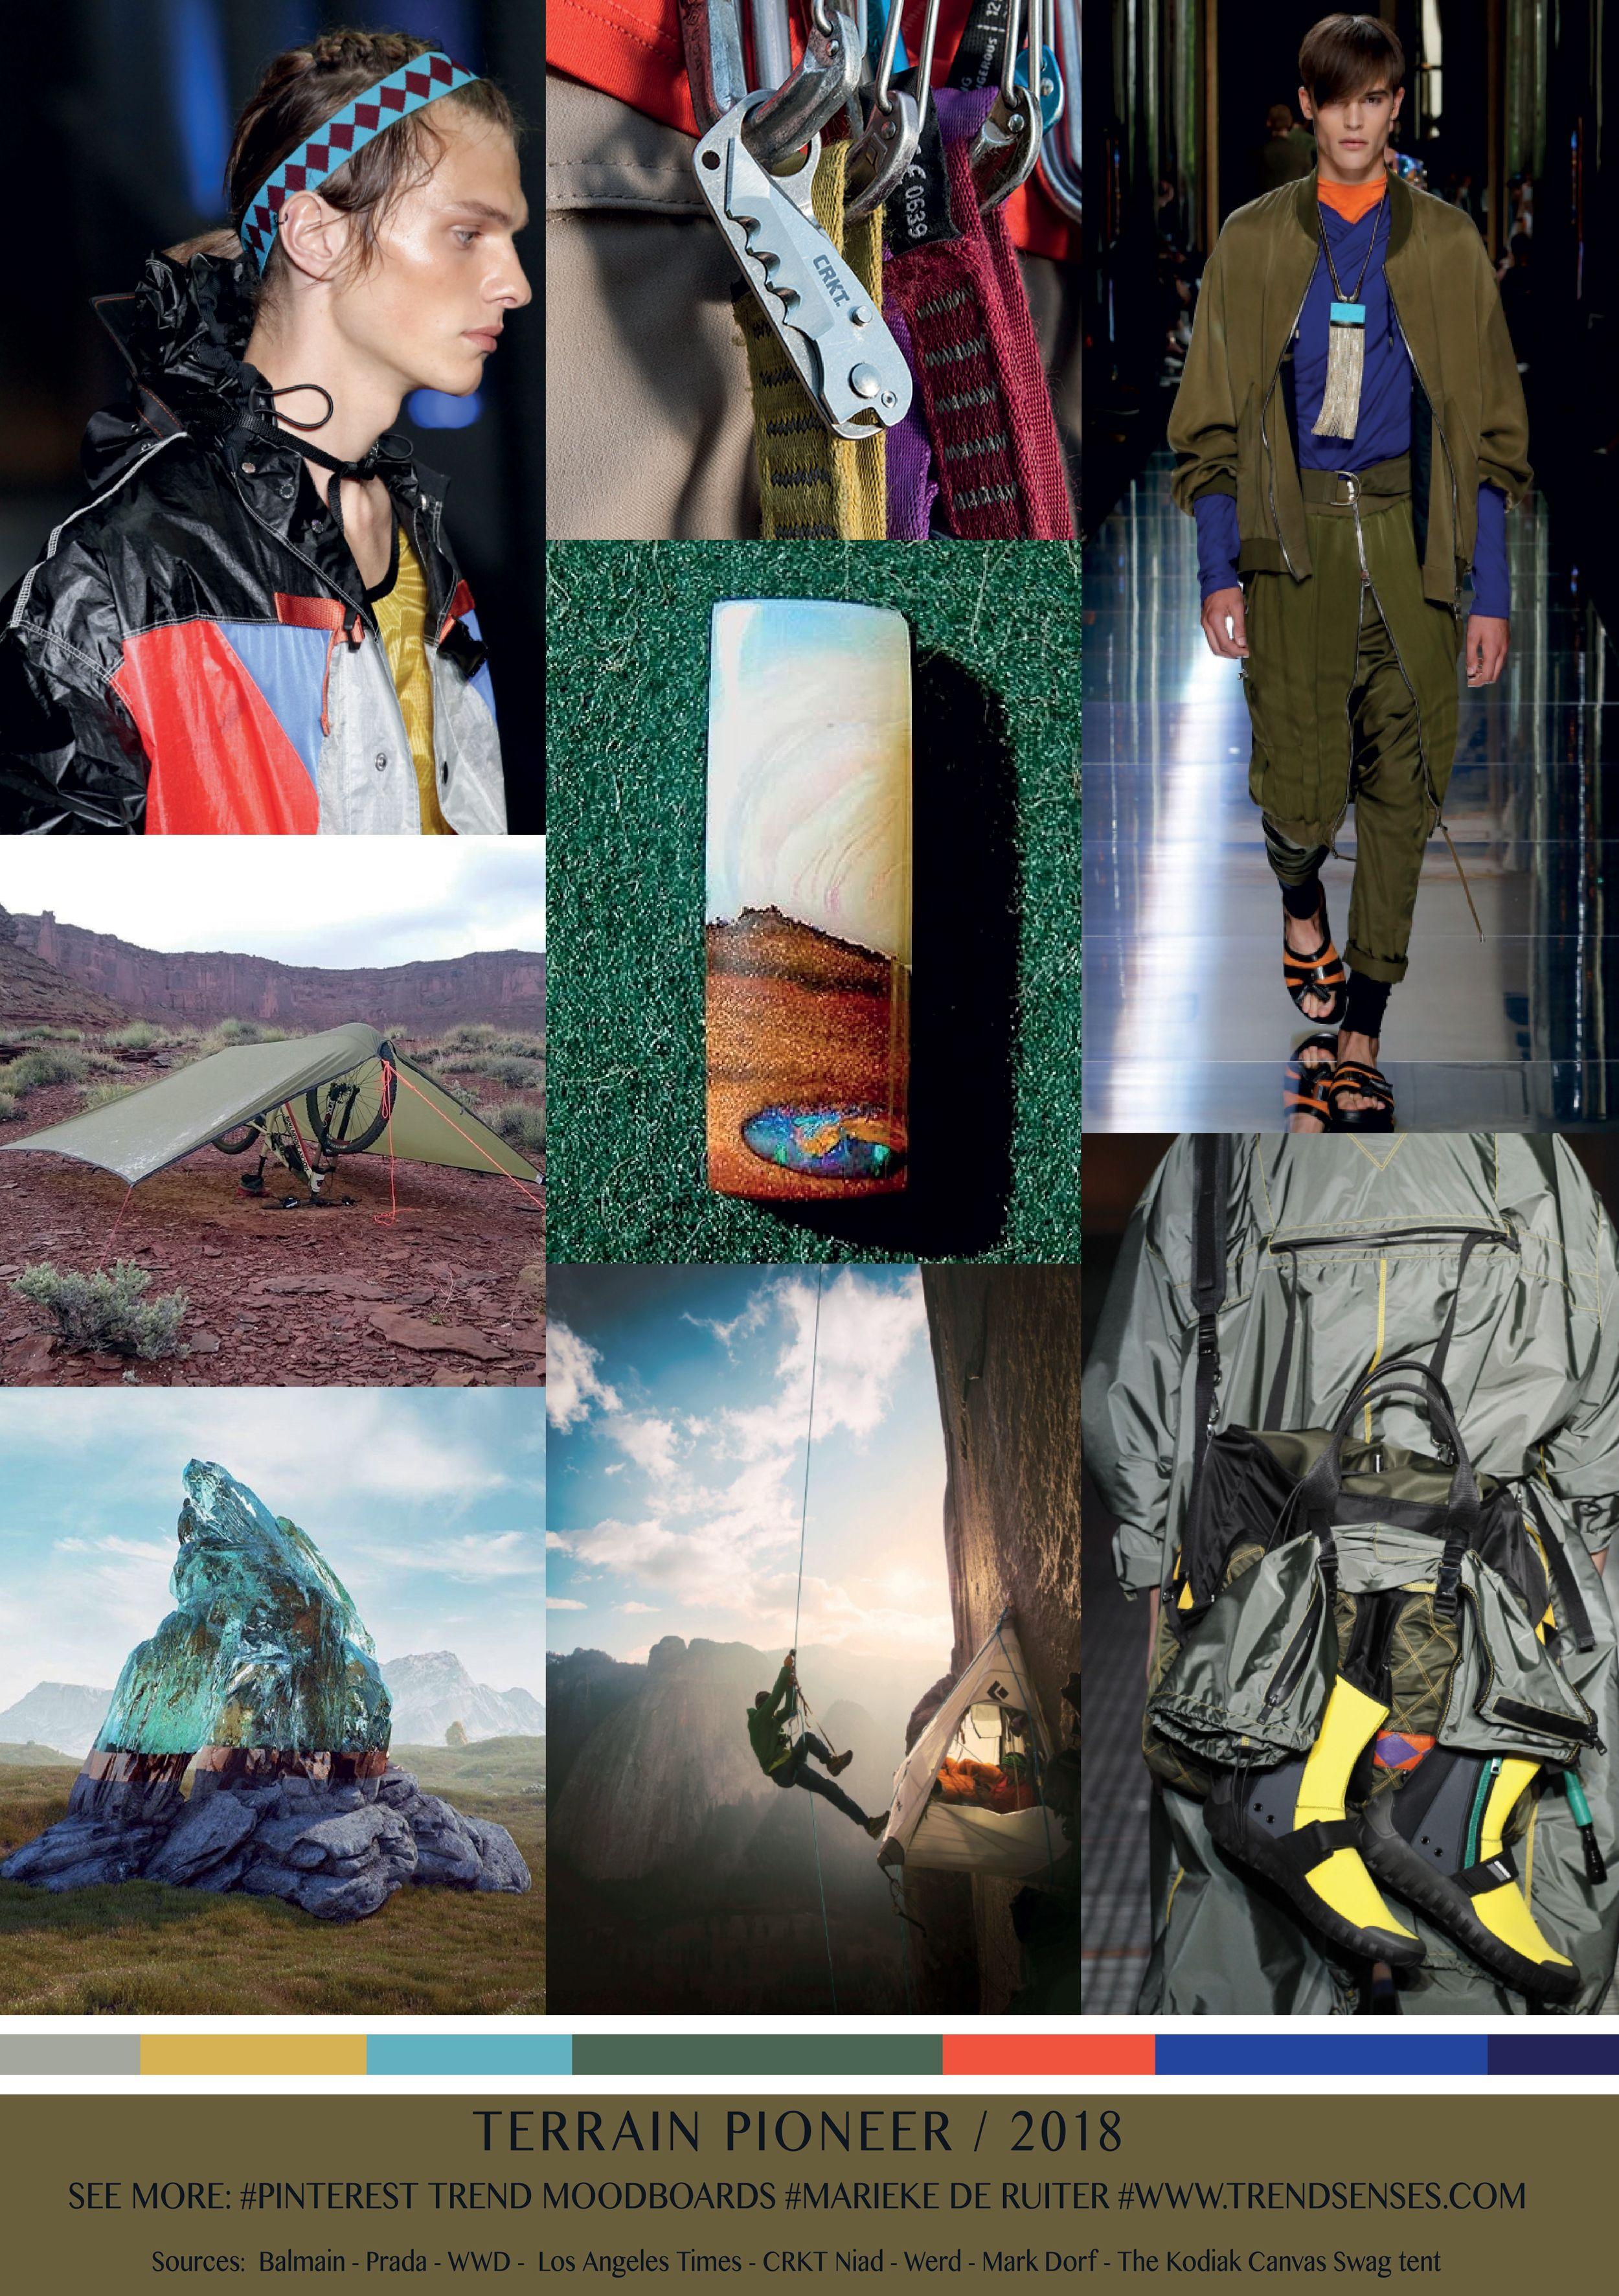 terrain pioneer trend 2018 2019 marieke de ruiter fashion aw 2018. Black Bedroom Furniture Sets. Home Design Ideas